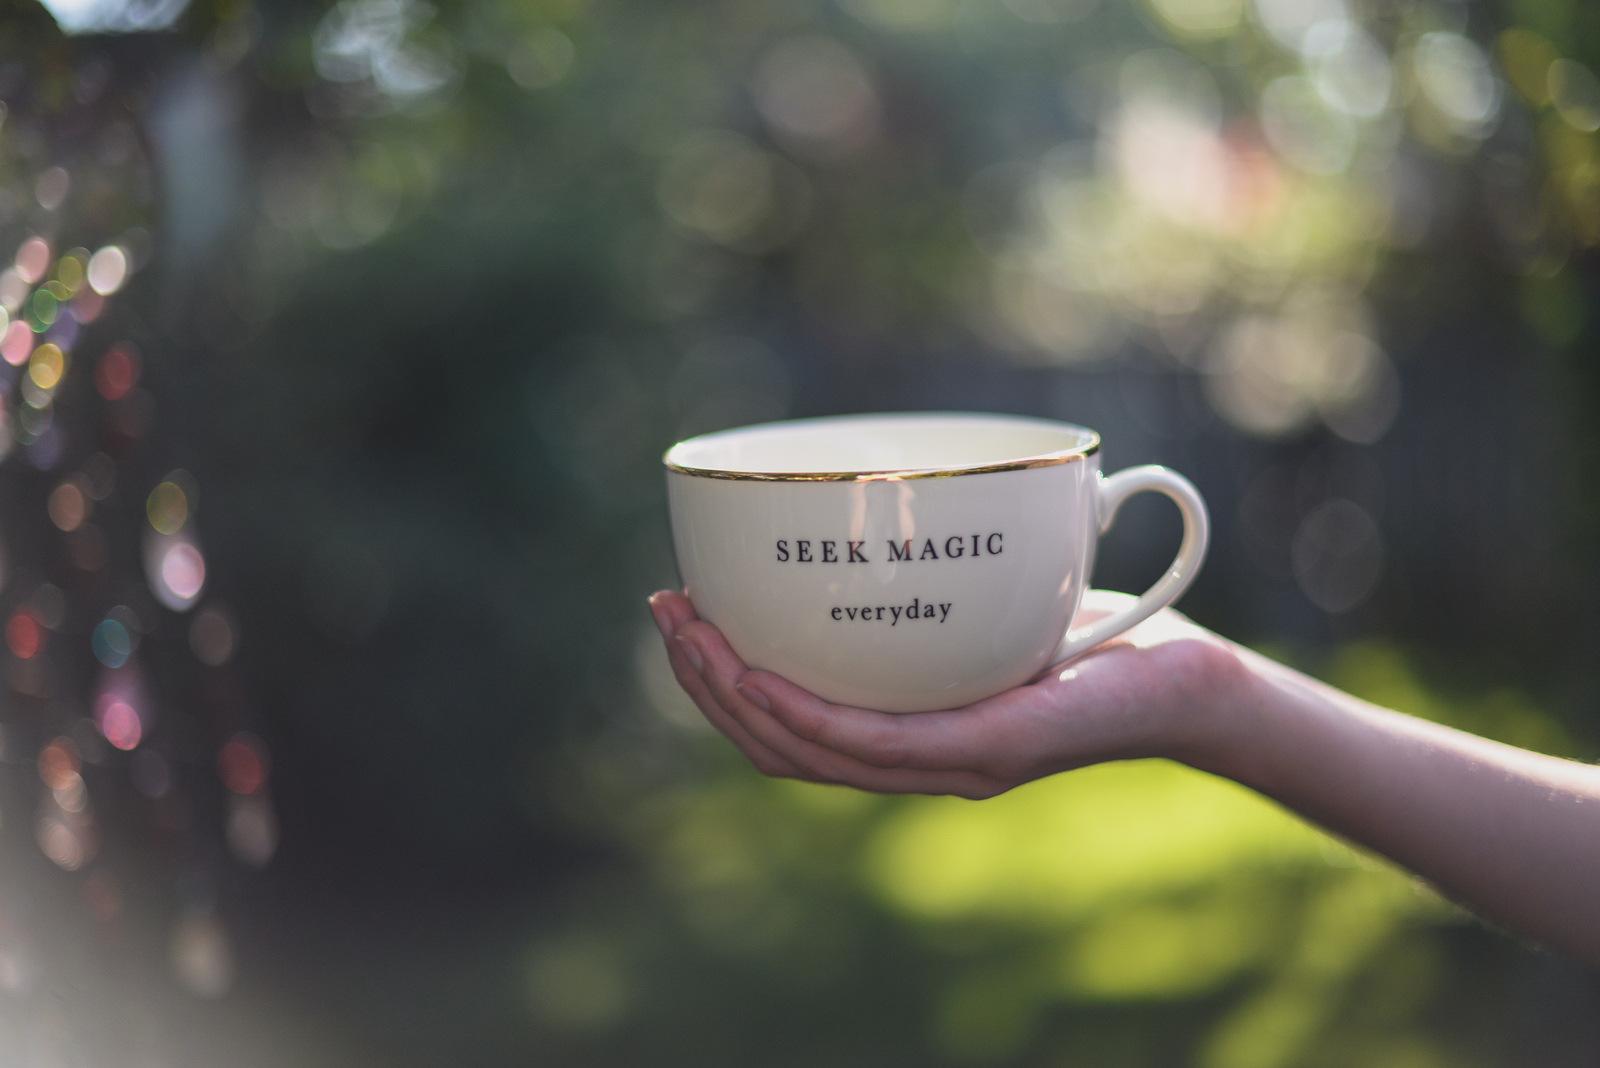 seek magic everyday